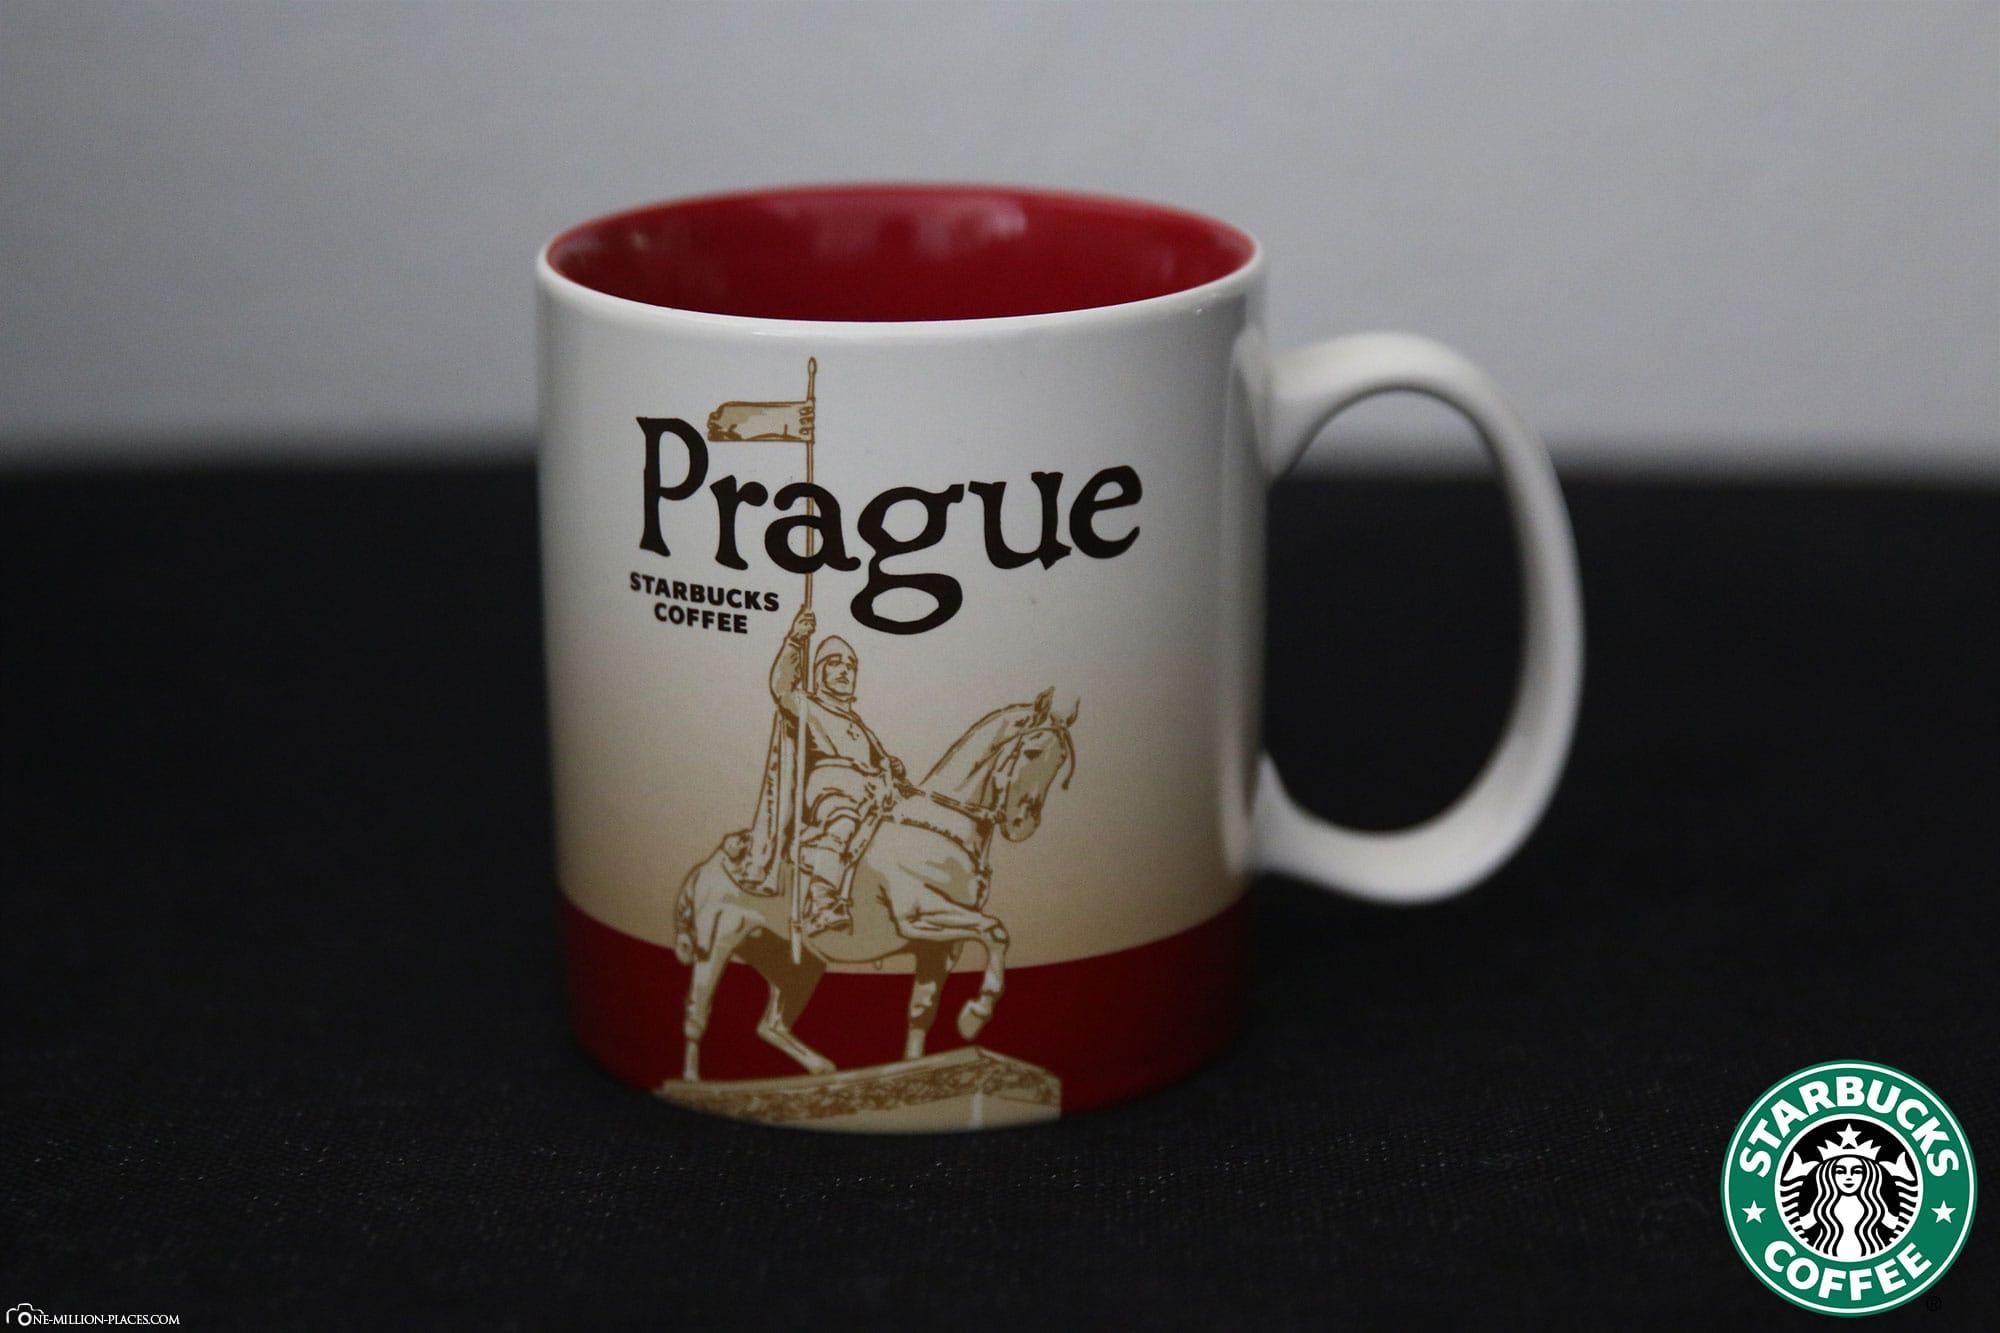 Prague, Starbucks Cup, Global Icon Series, City Mugs, Collection, Czech Republic, Travelreport